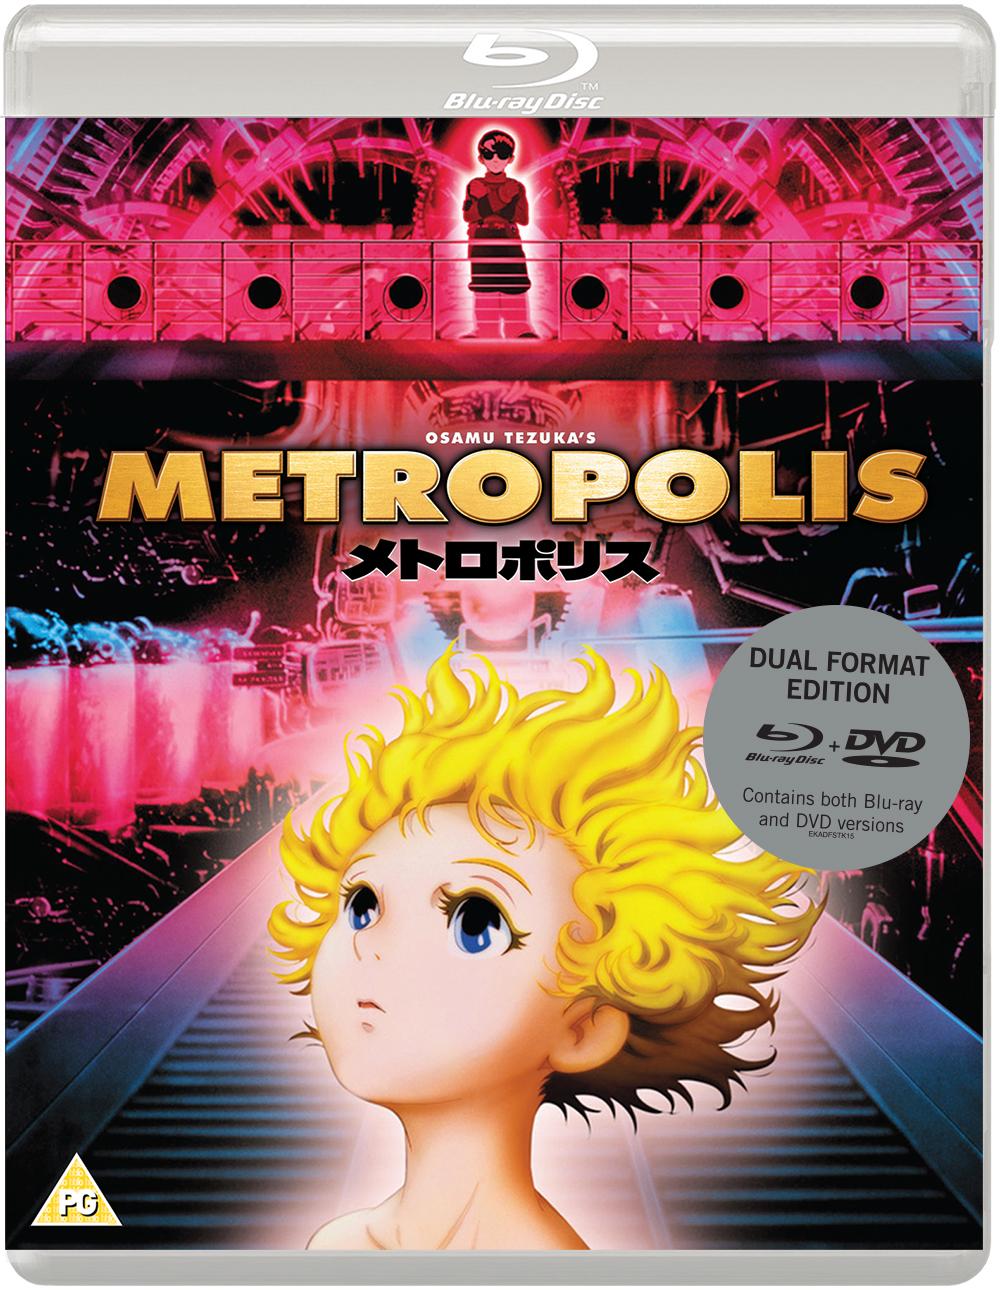 Metropolis Blu-ray review: no, not that one